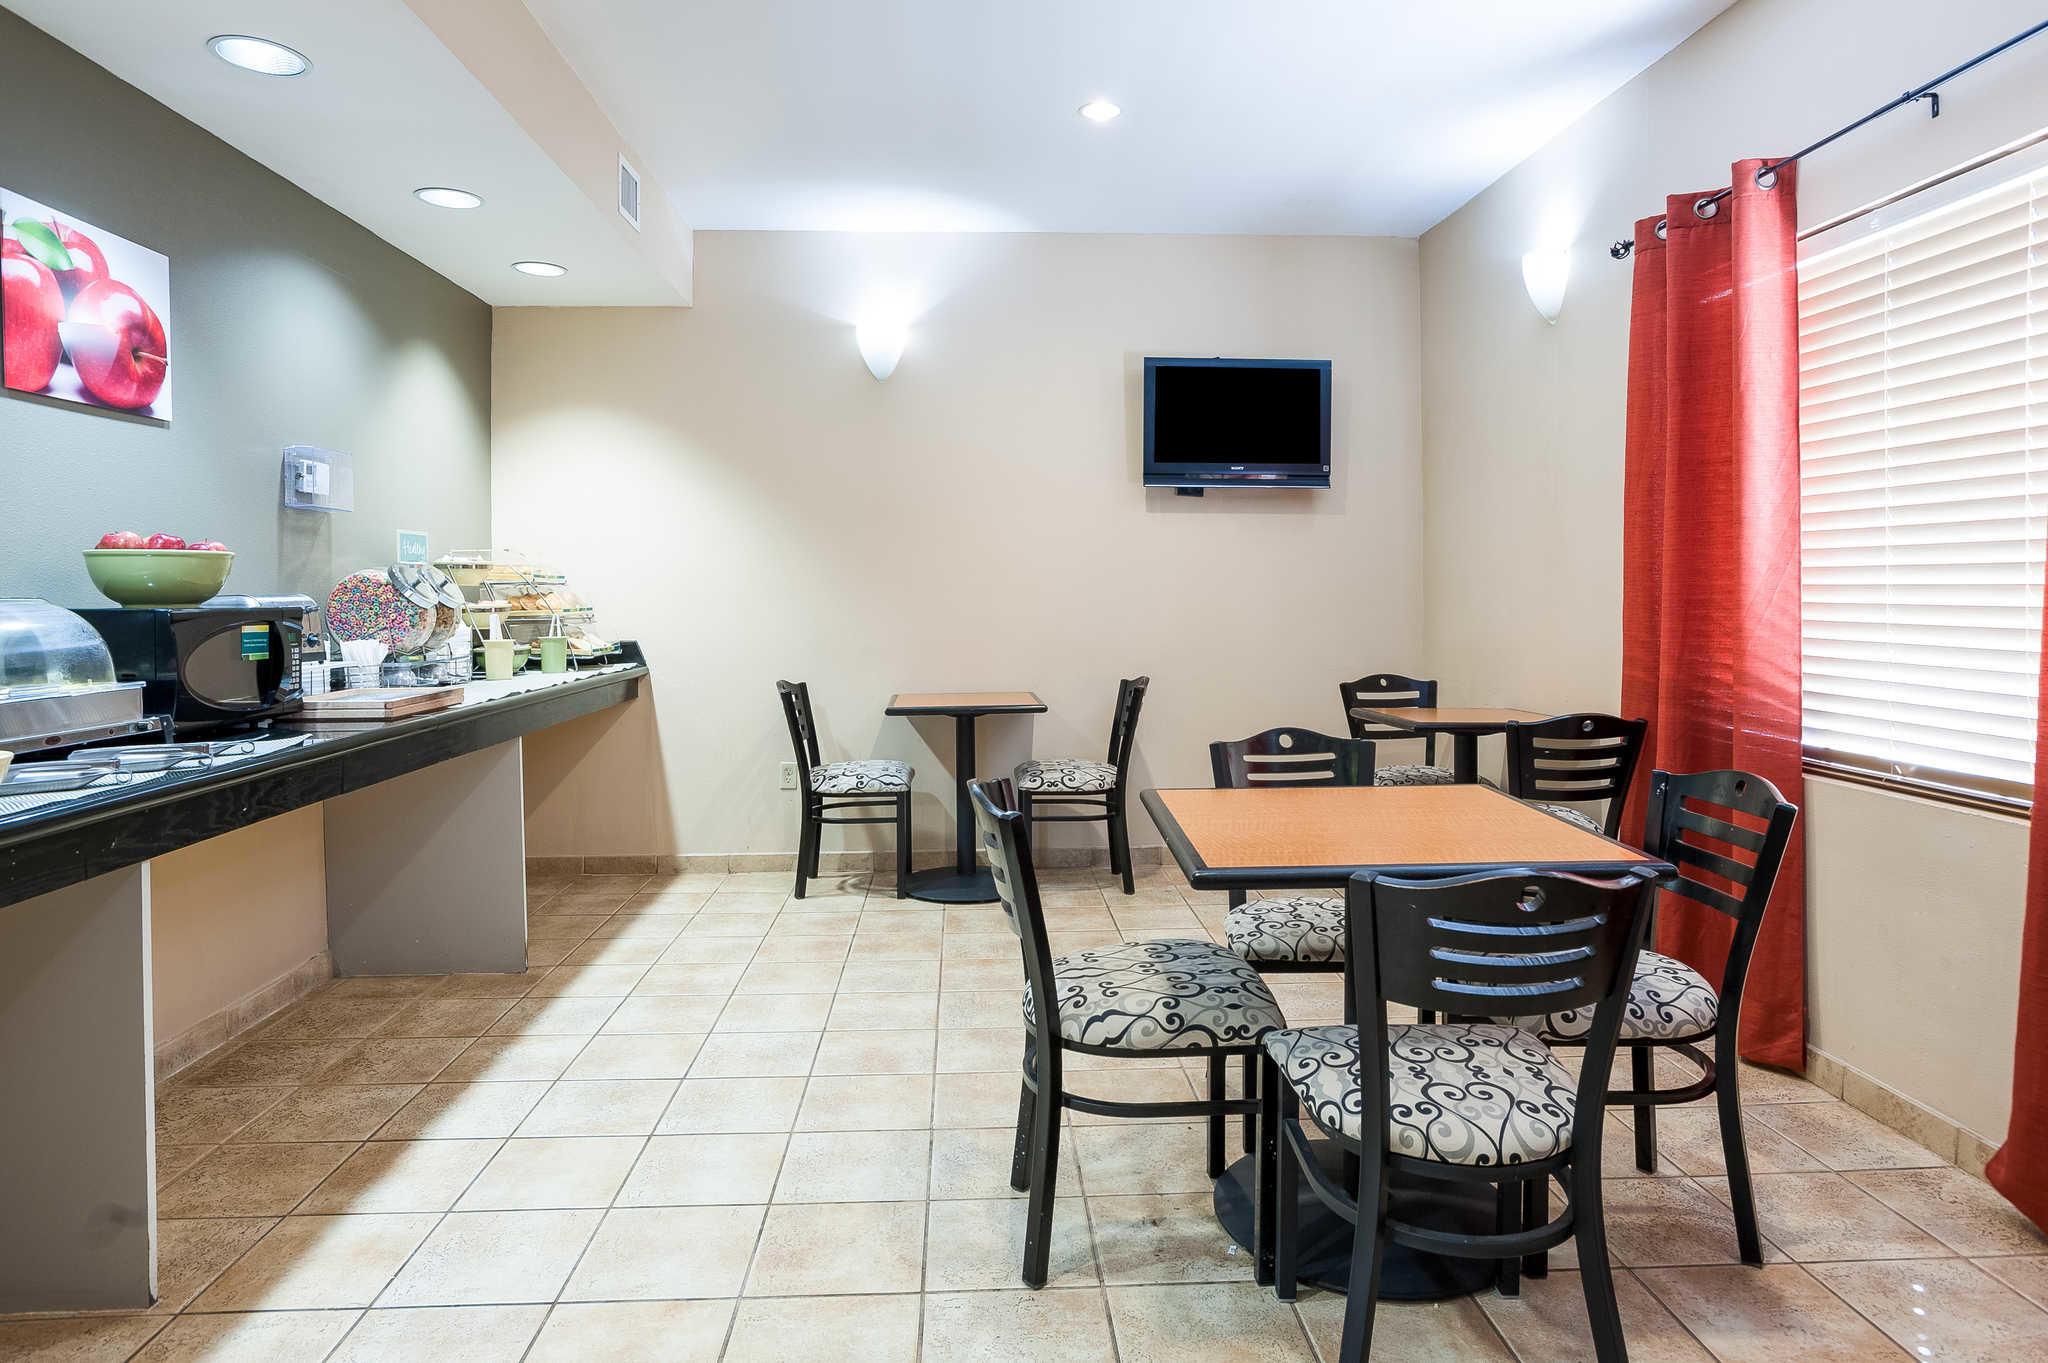 Quality Inn & Suites image 39